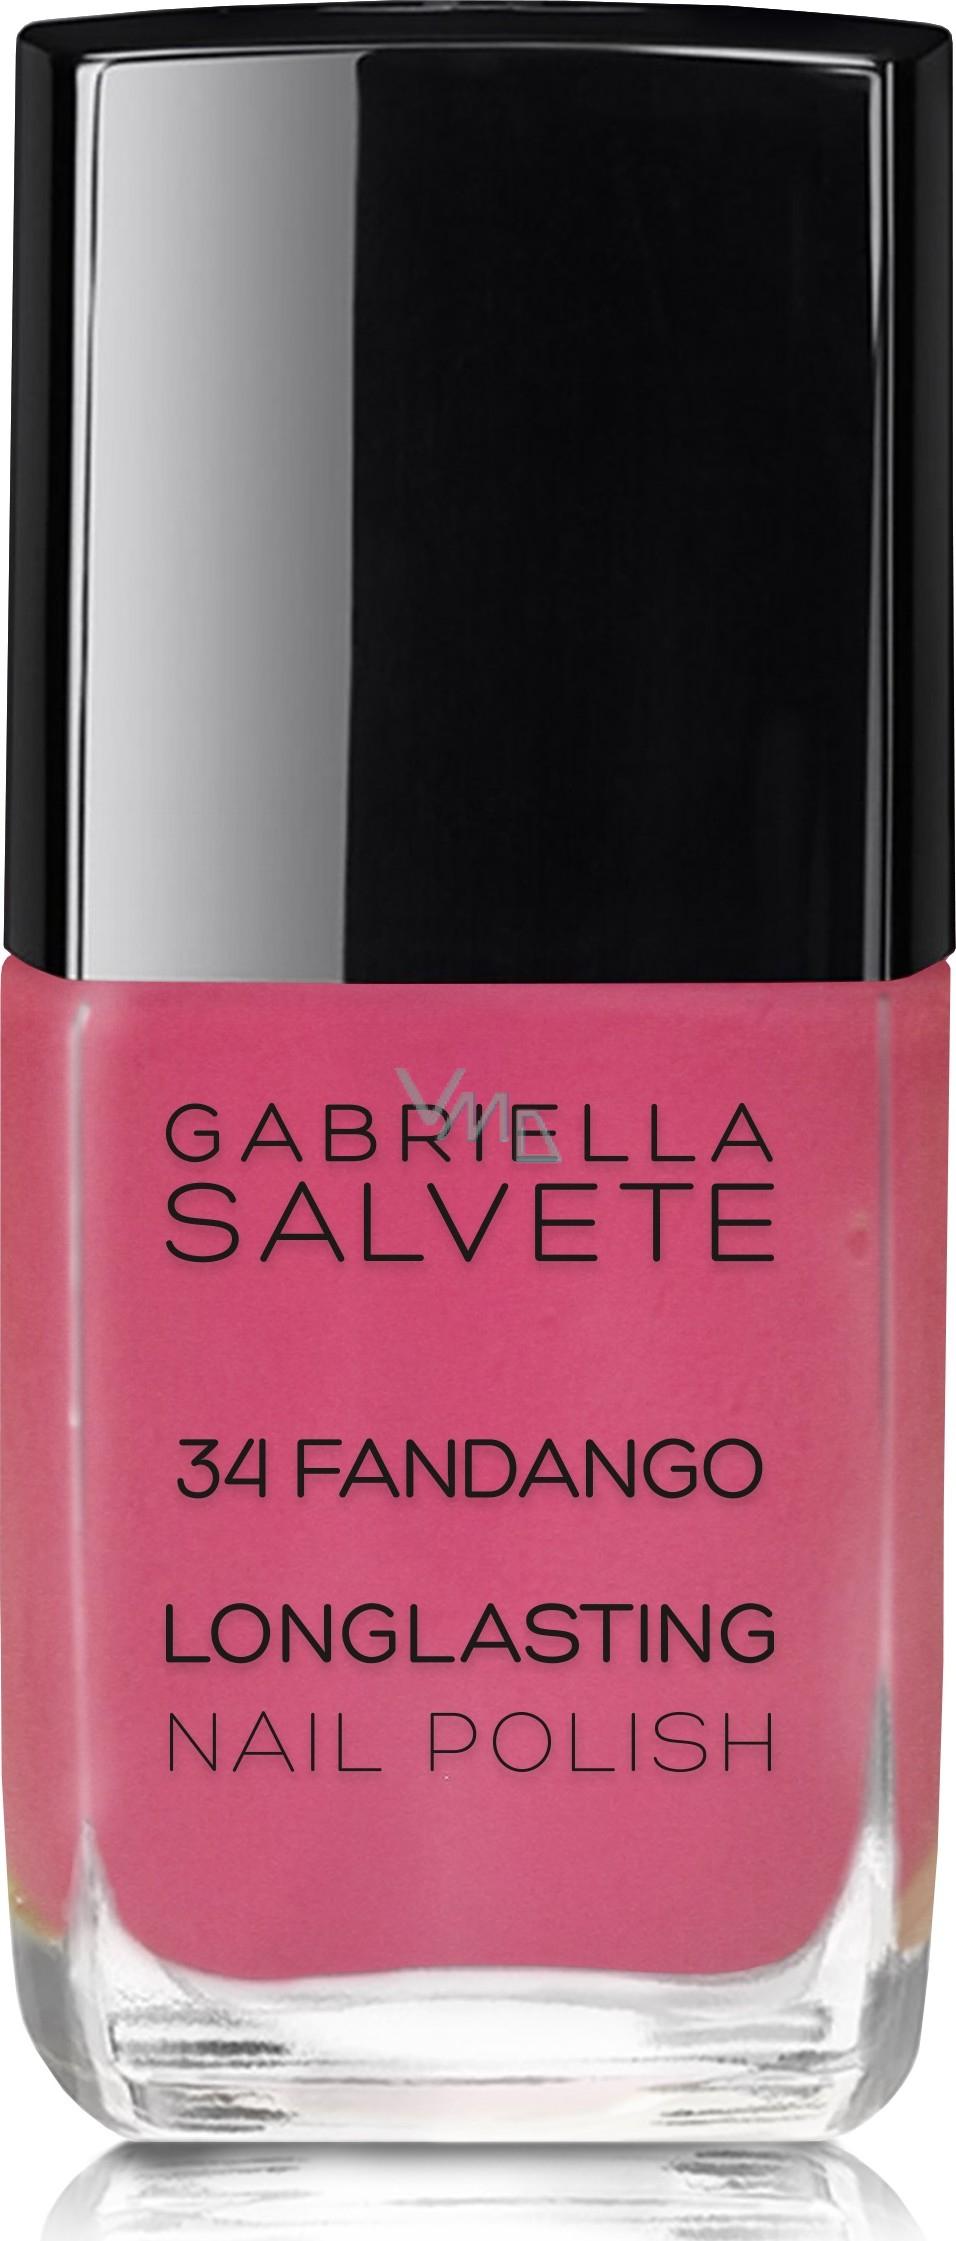 Gabriella Salvete Longlasting Enamel Lak Na Nehty 34 Fandango 11 Ml Vmd Drogerie A Parfumerie